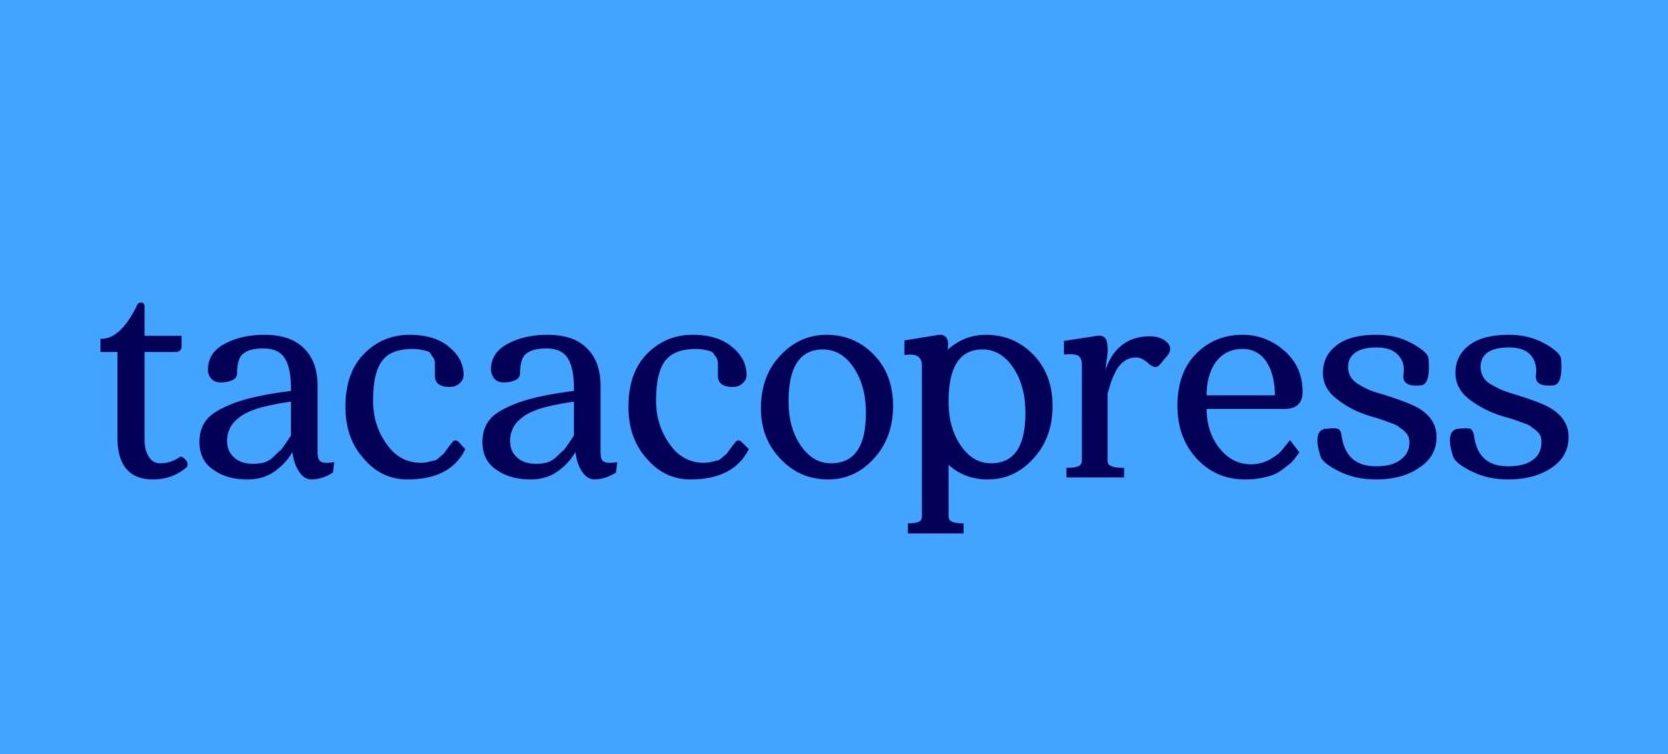 tacacopress